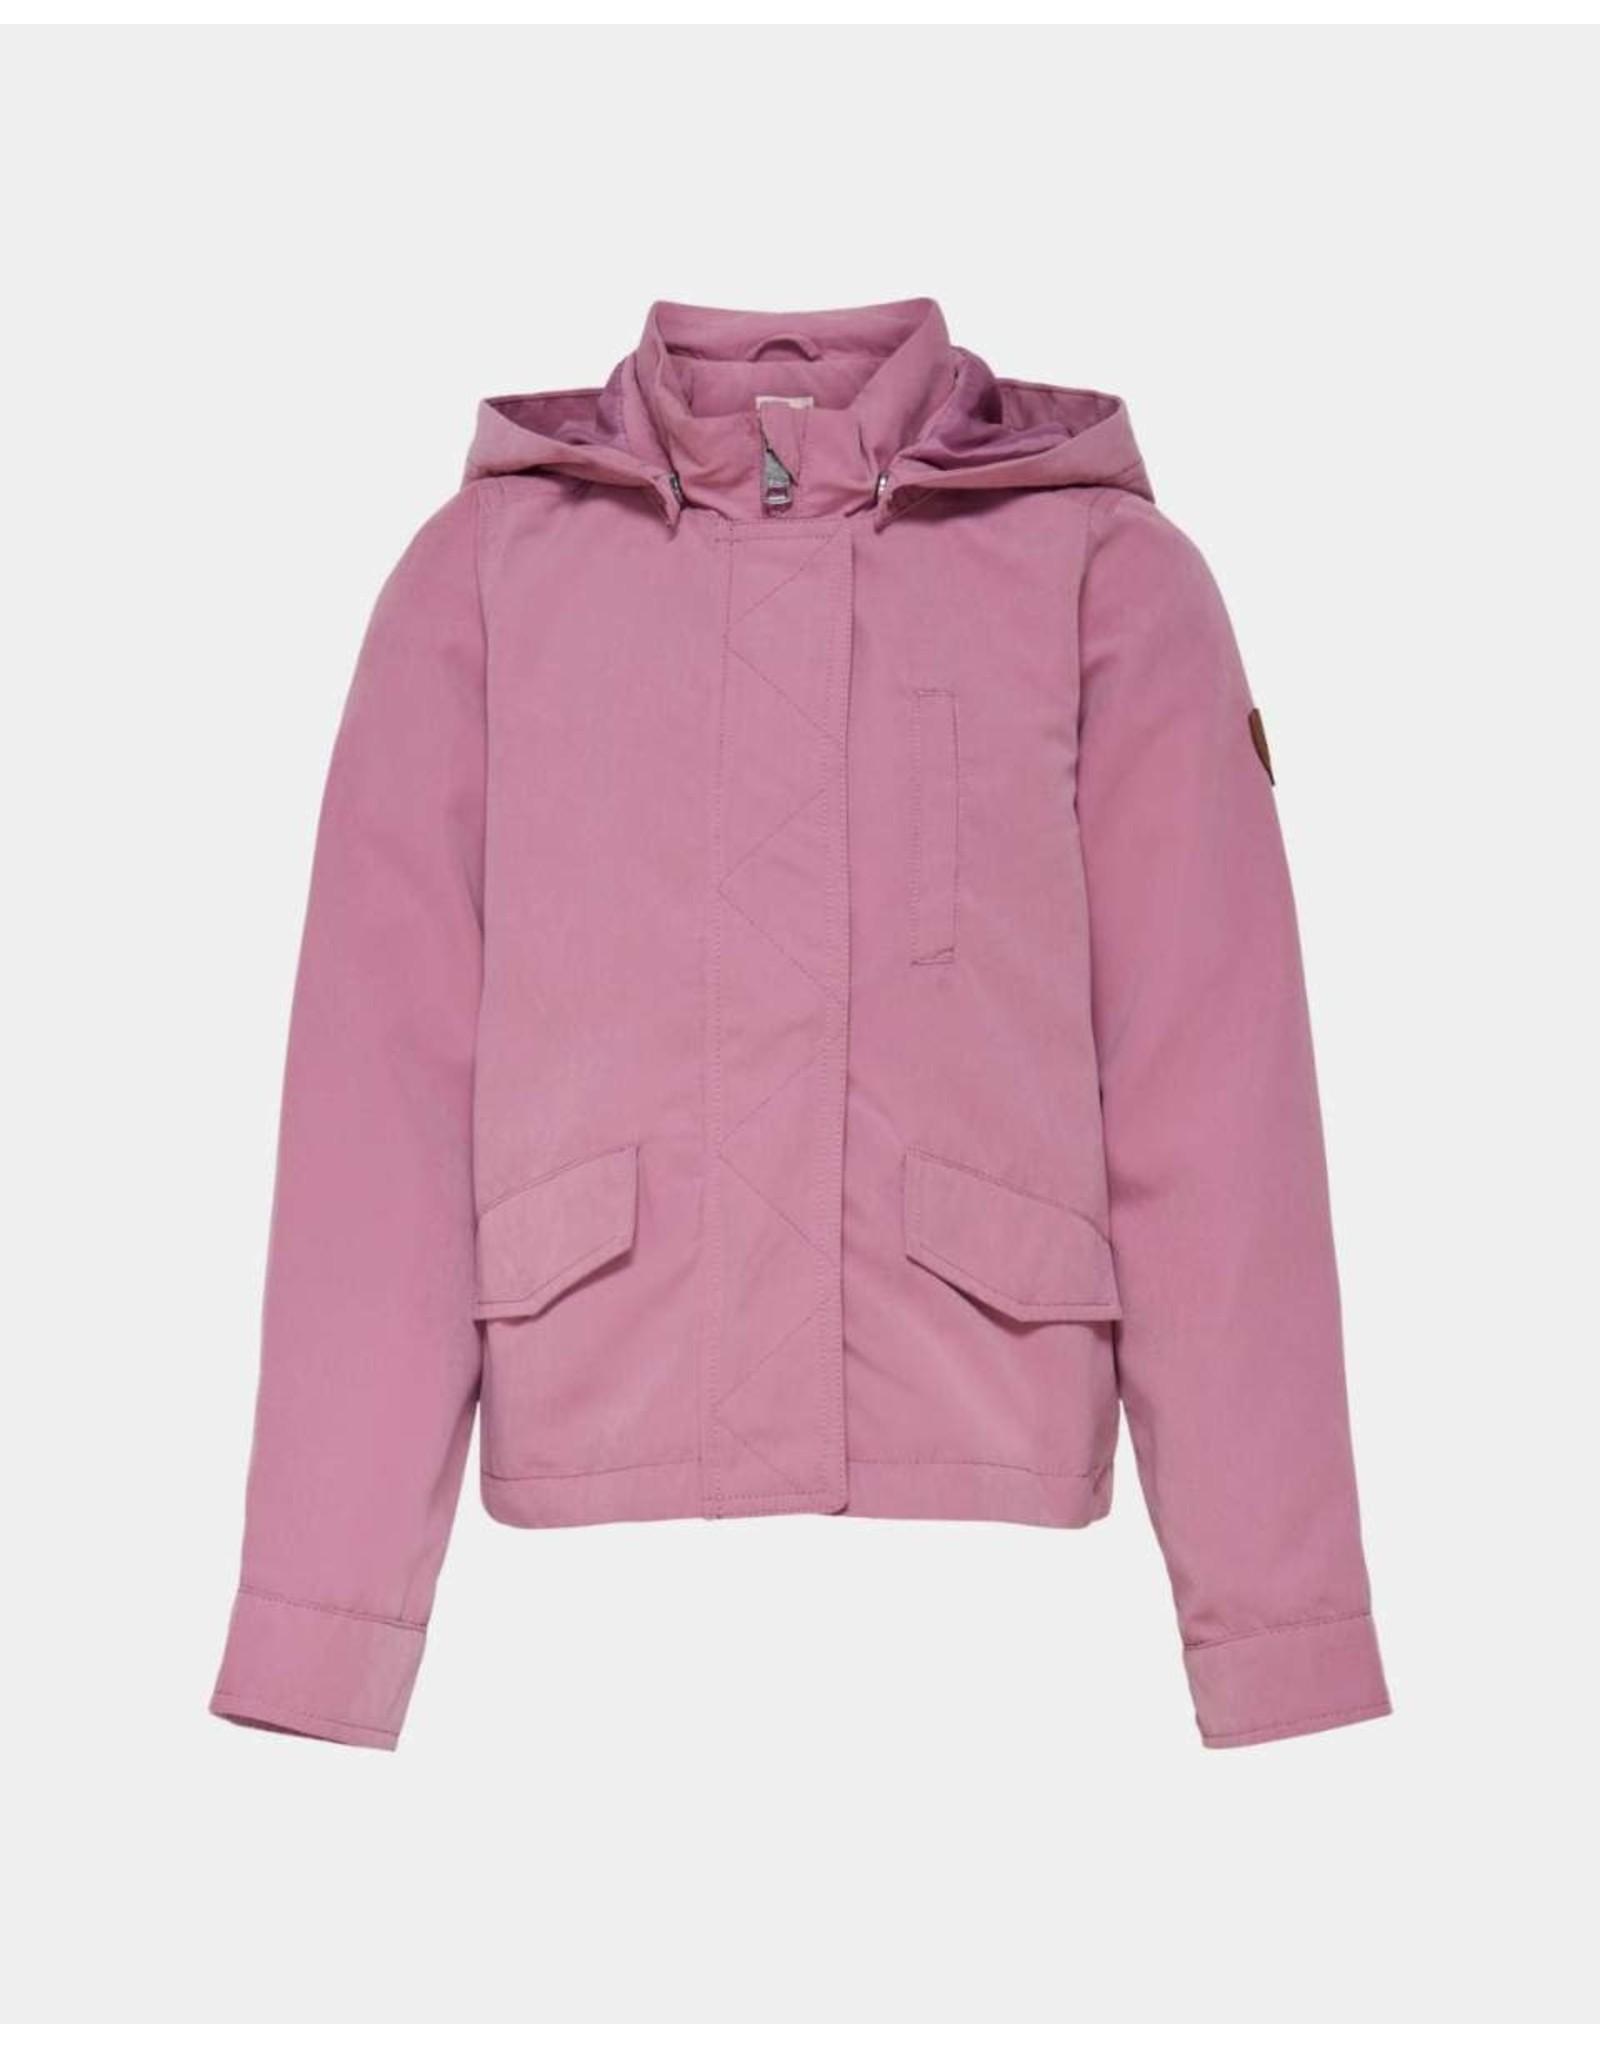 KIDS ONLY Roze tussenseizoen jas